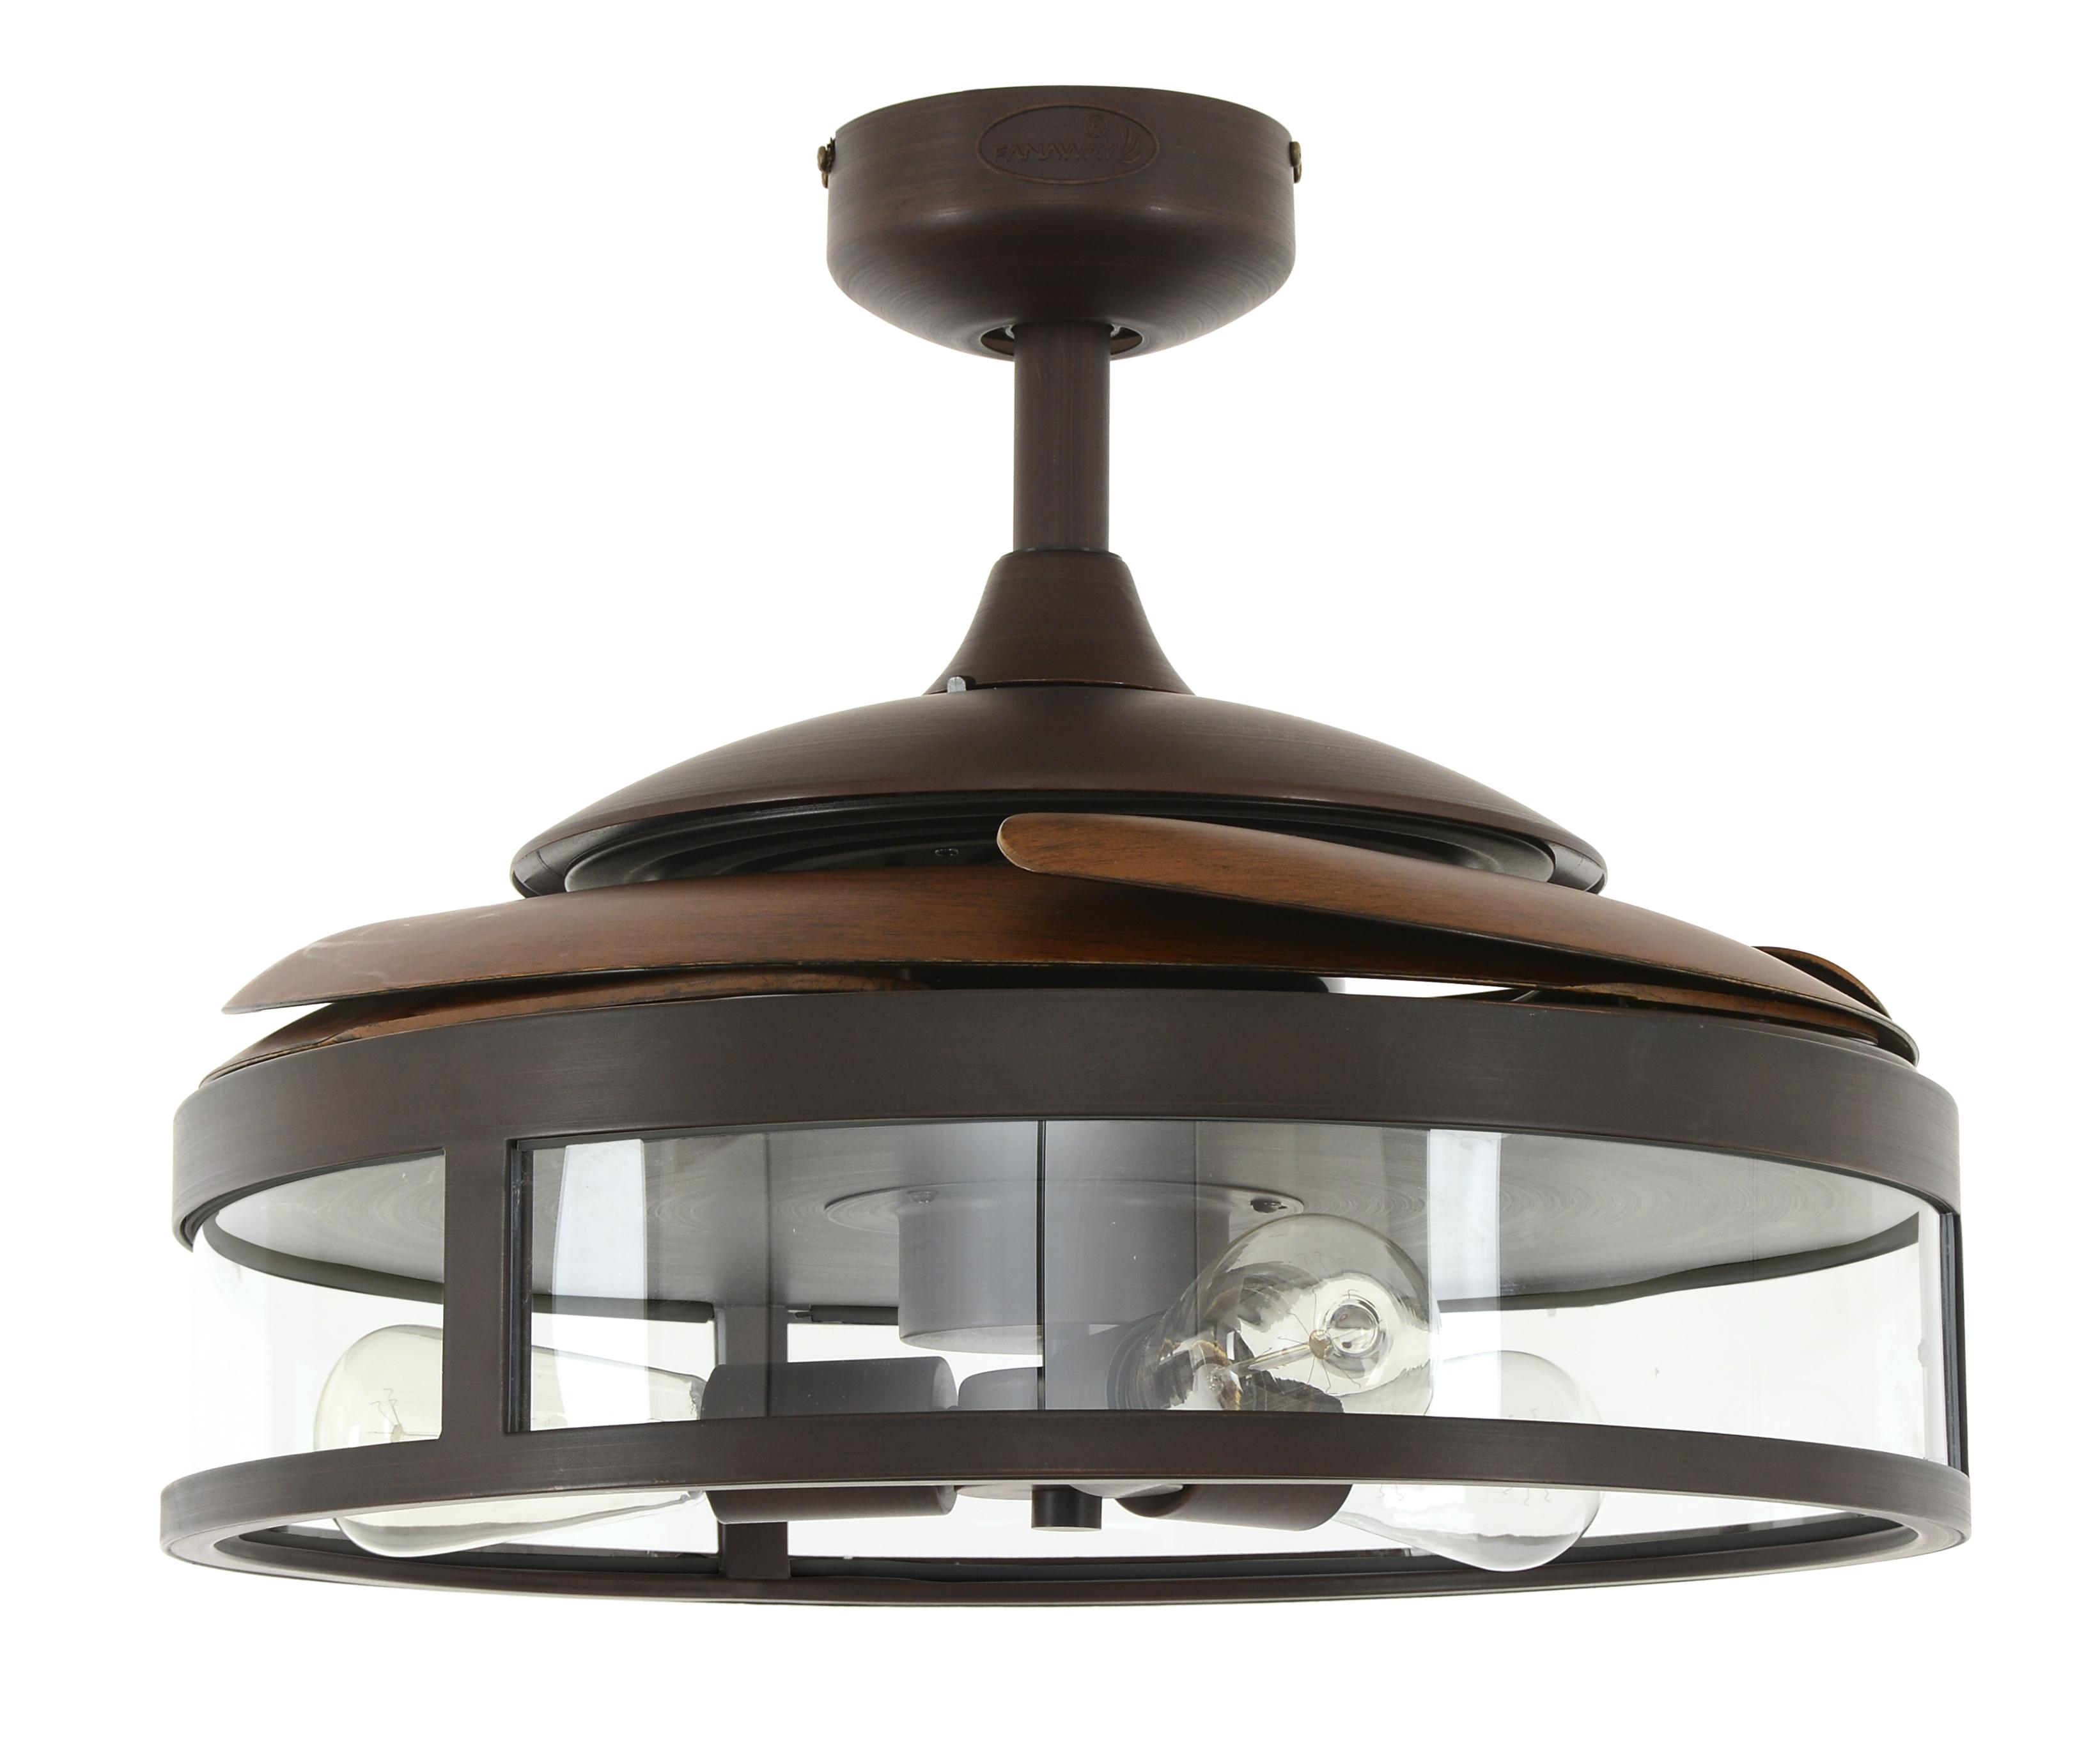 deckenventilator fanaway classic oil brushed bronze deckenventilator deckenventilatoren mit. Black Bedroom Furniture Sets. Home Design Ideas